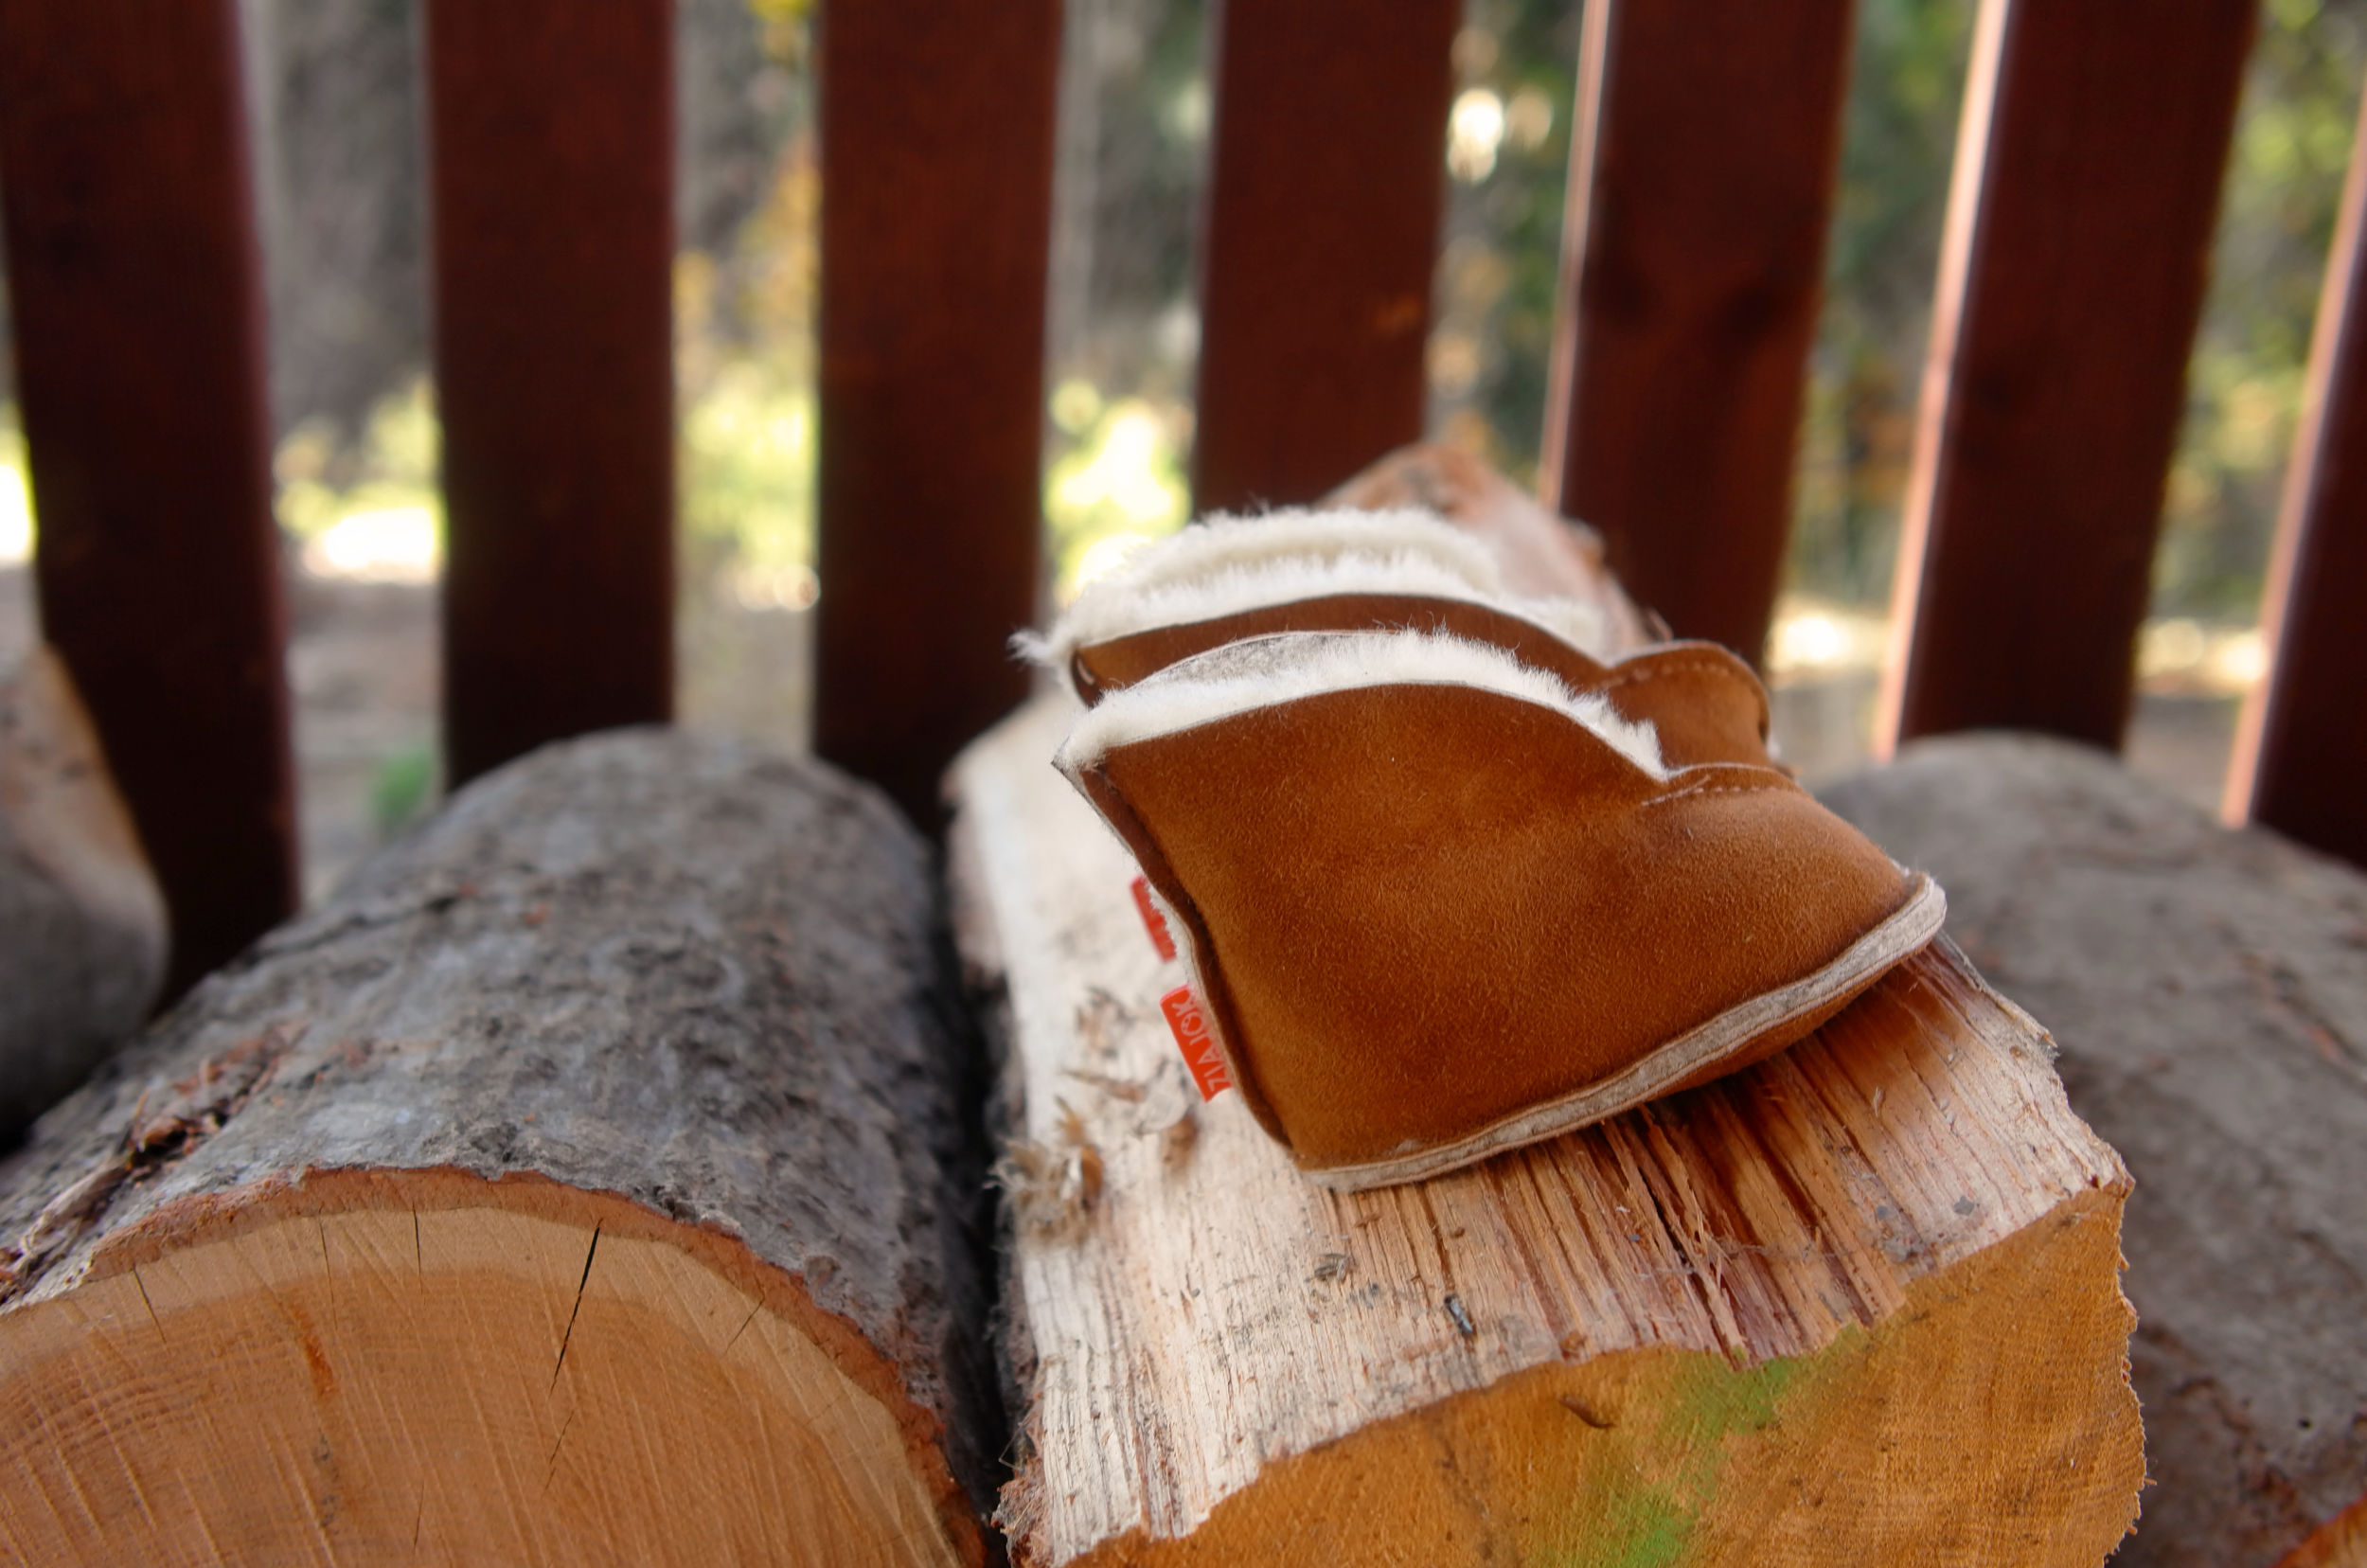 BUCIKI na drewienkuSESJA2